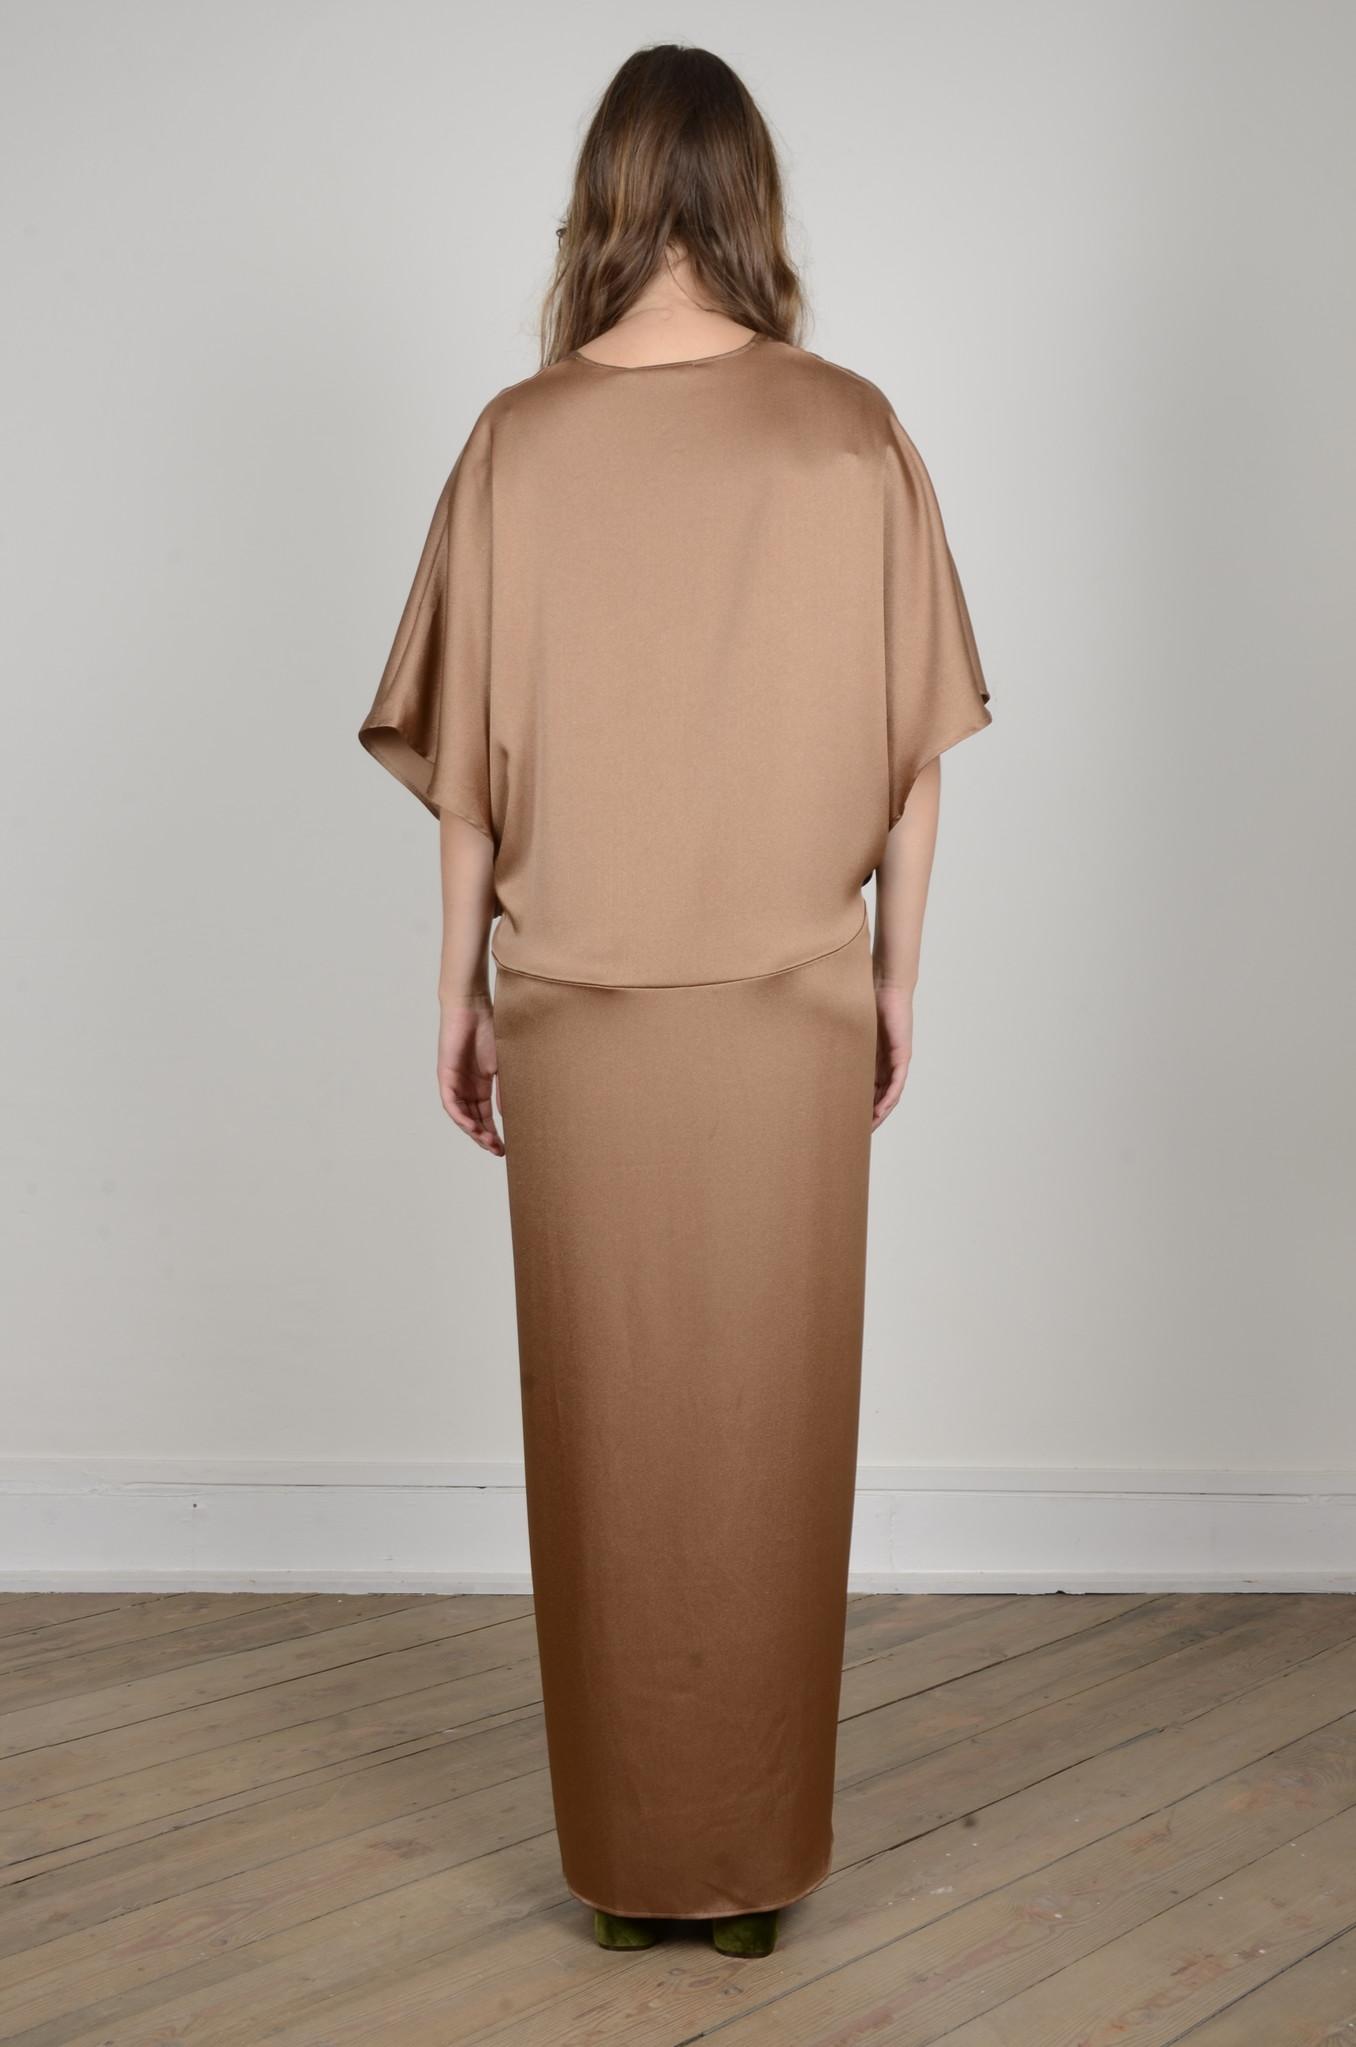 SATIN DRESS NUGGET-3